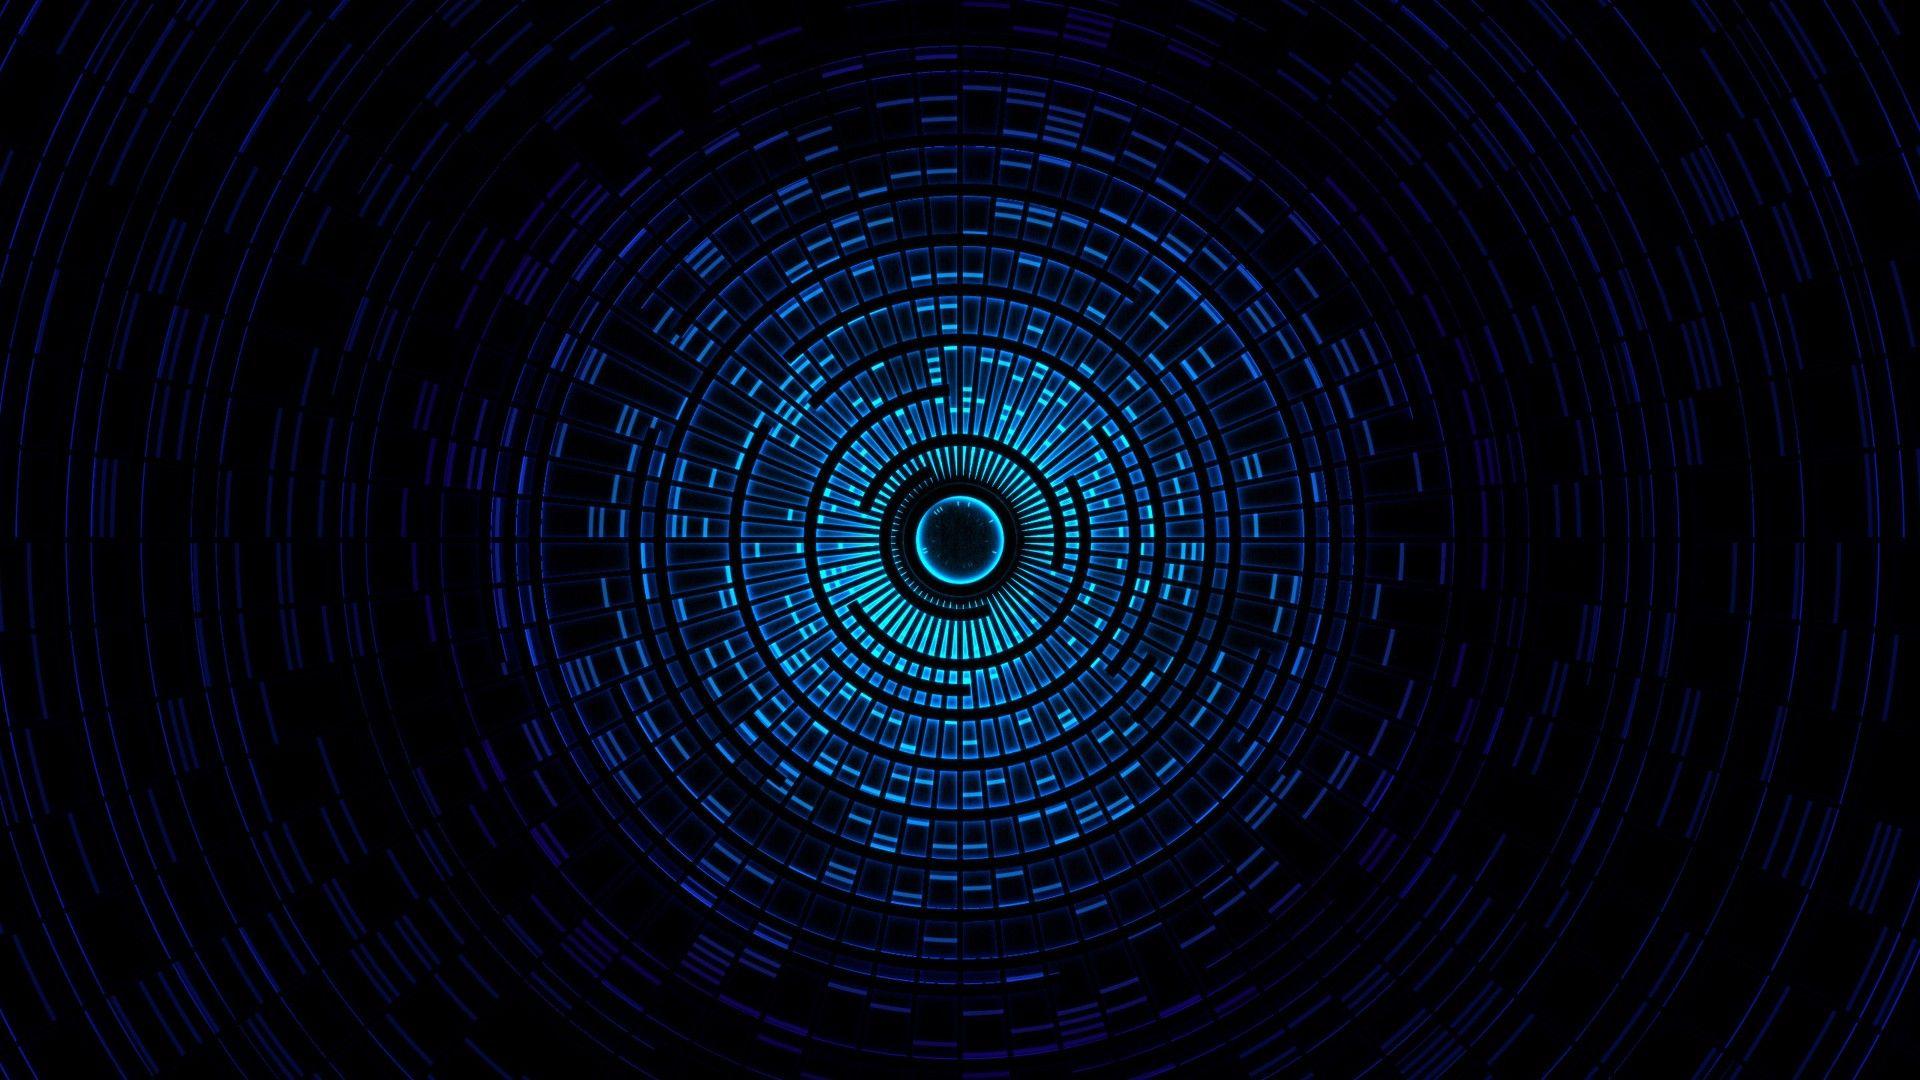 Abstract Digital Blasphemy Lights Tunnels Wallpaper 1793822 Wallbase Cc Black And Blue Wallpaper Dark Blue Wallpaper Blue Abstract